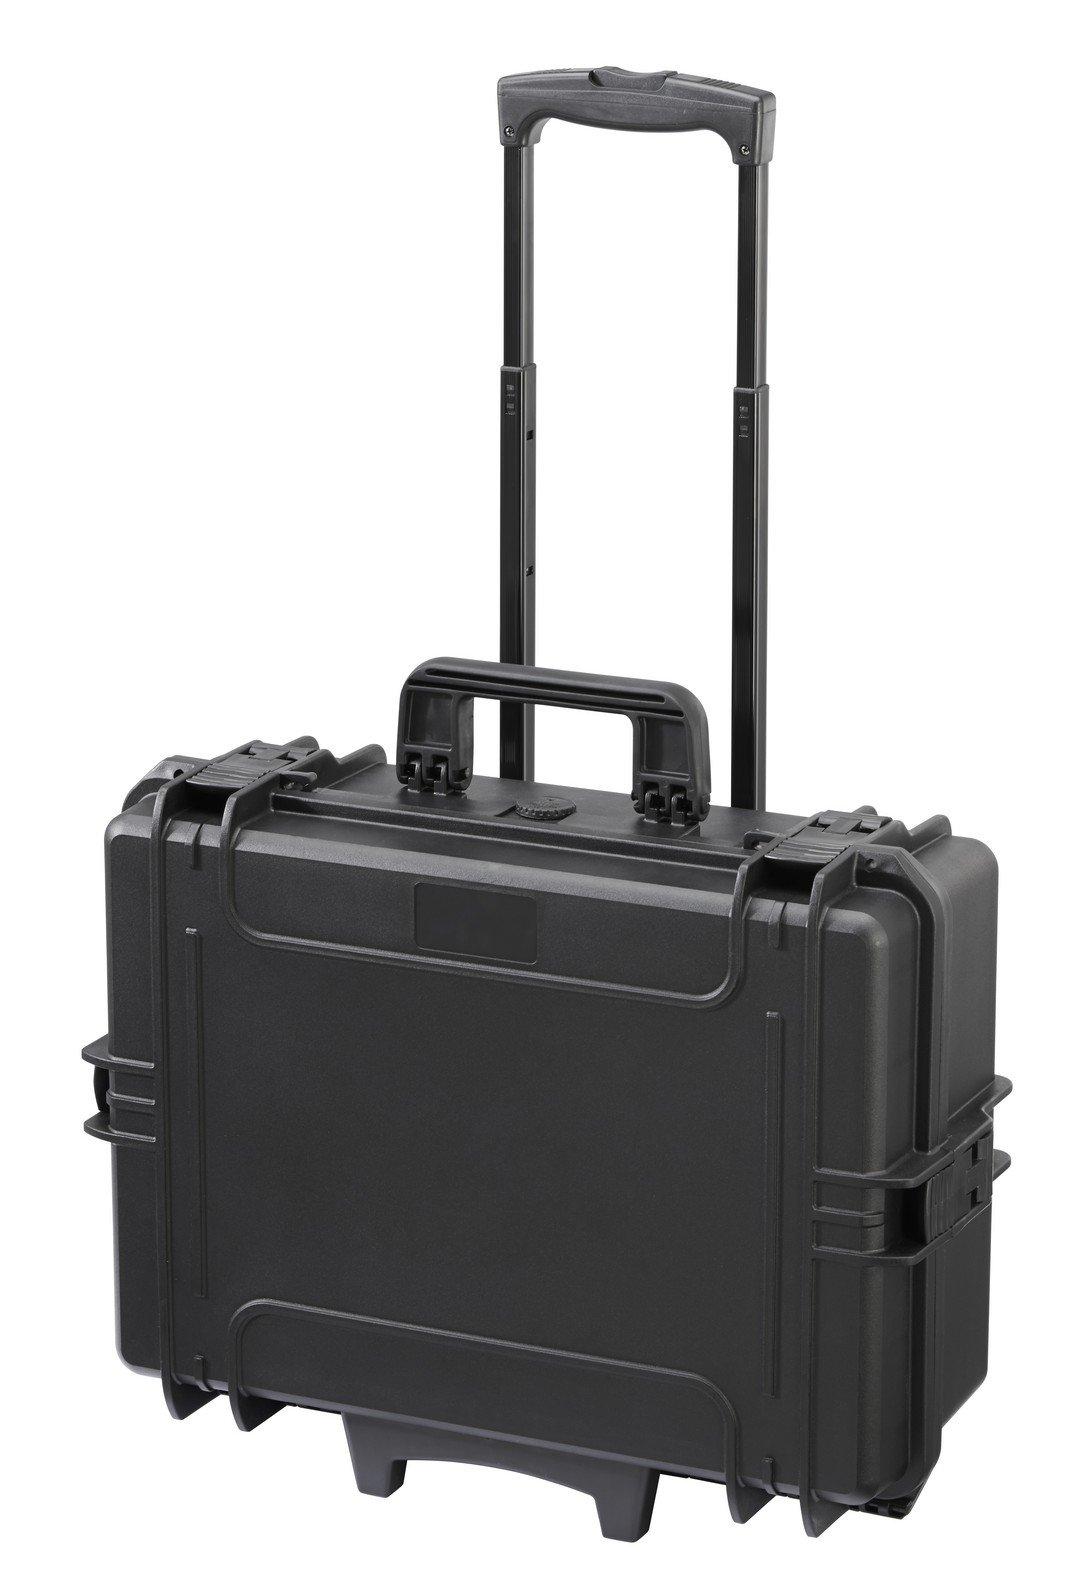 Item Box: 505 MAX TR CAM waterproof IP67